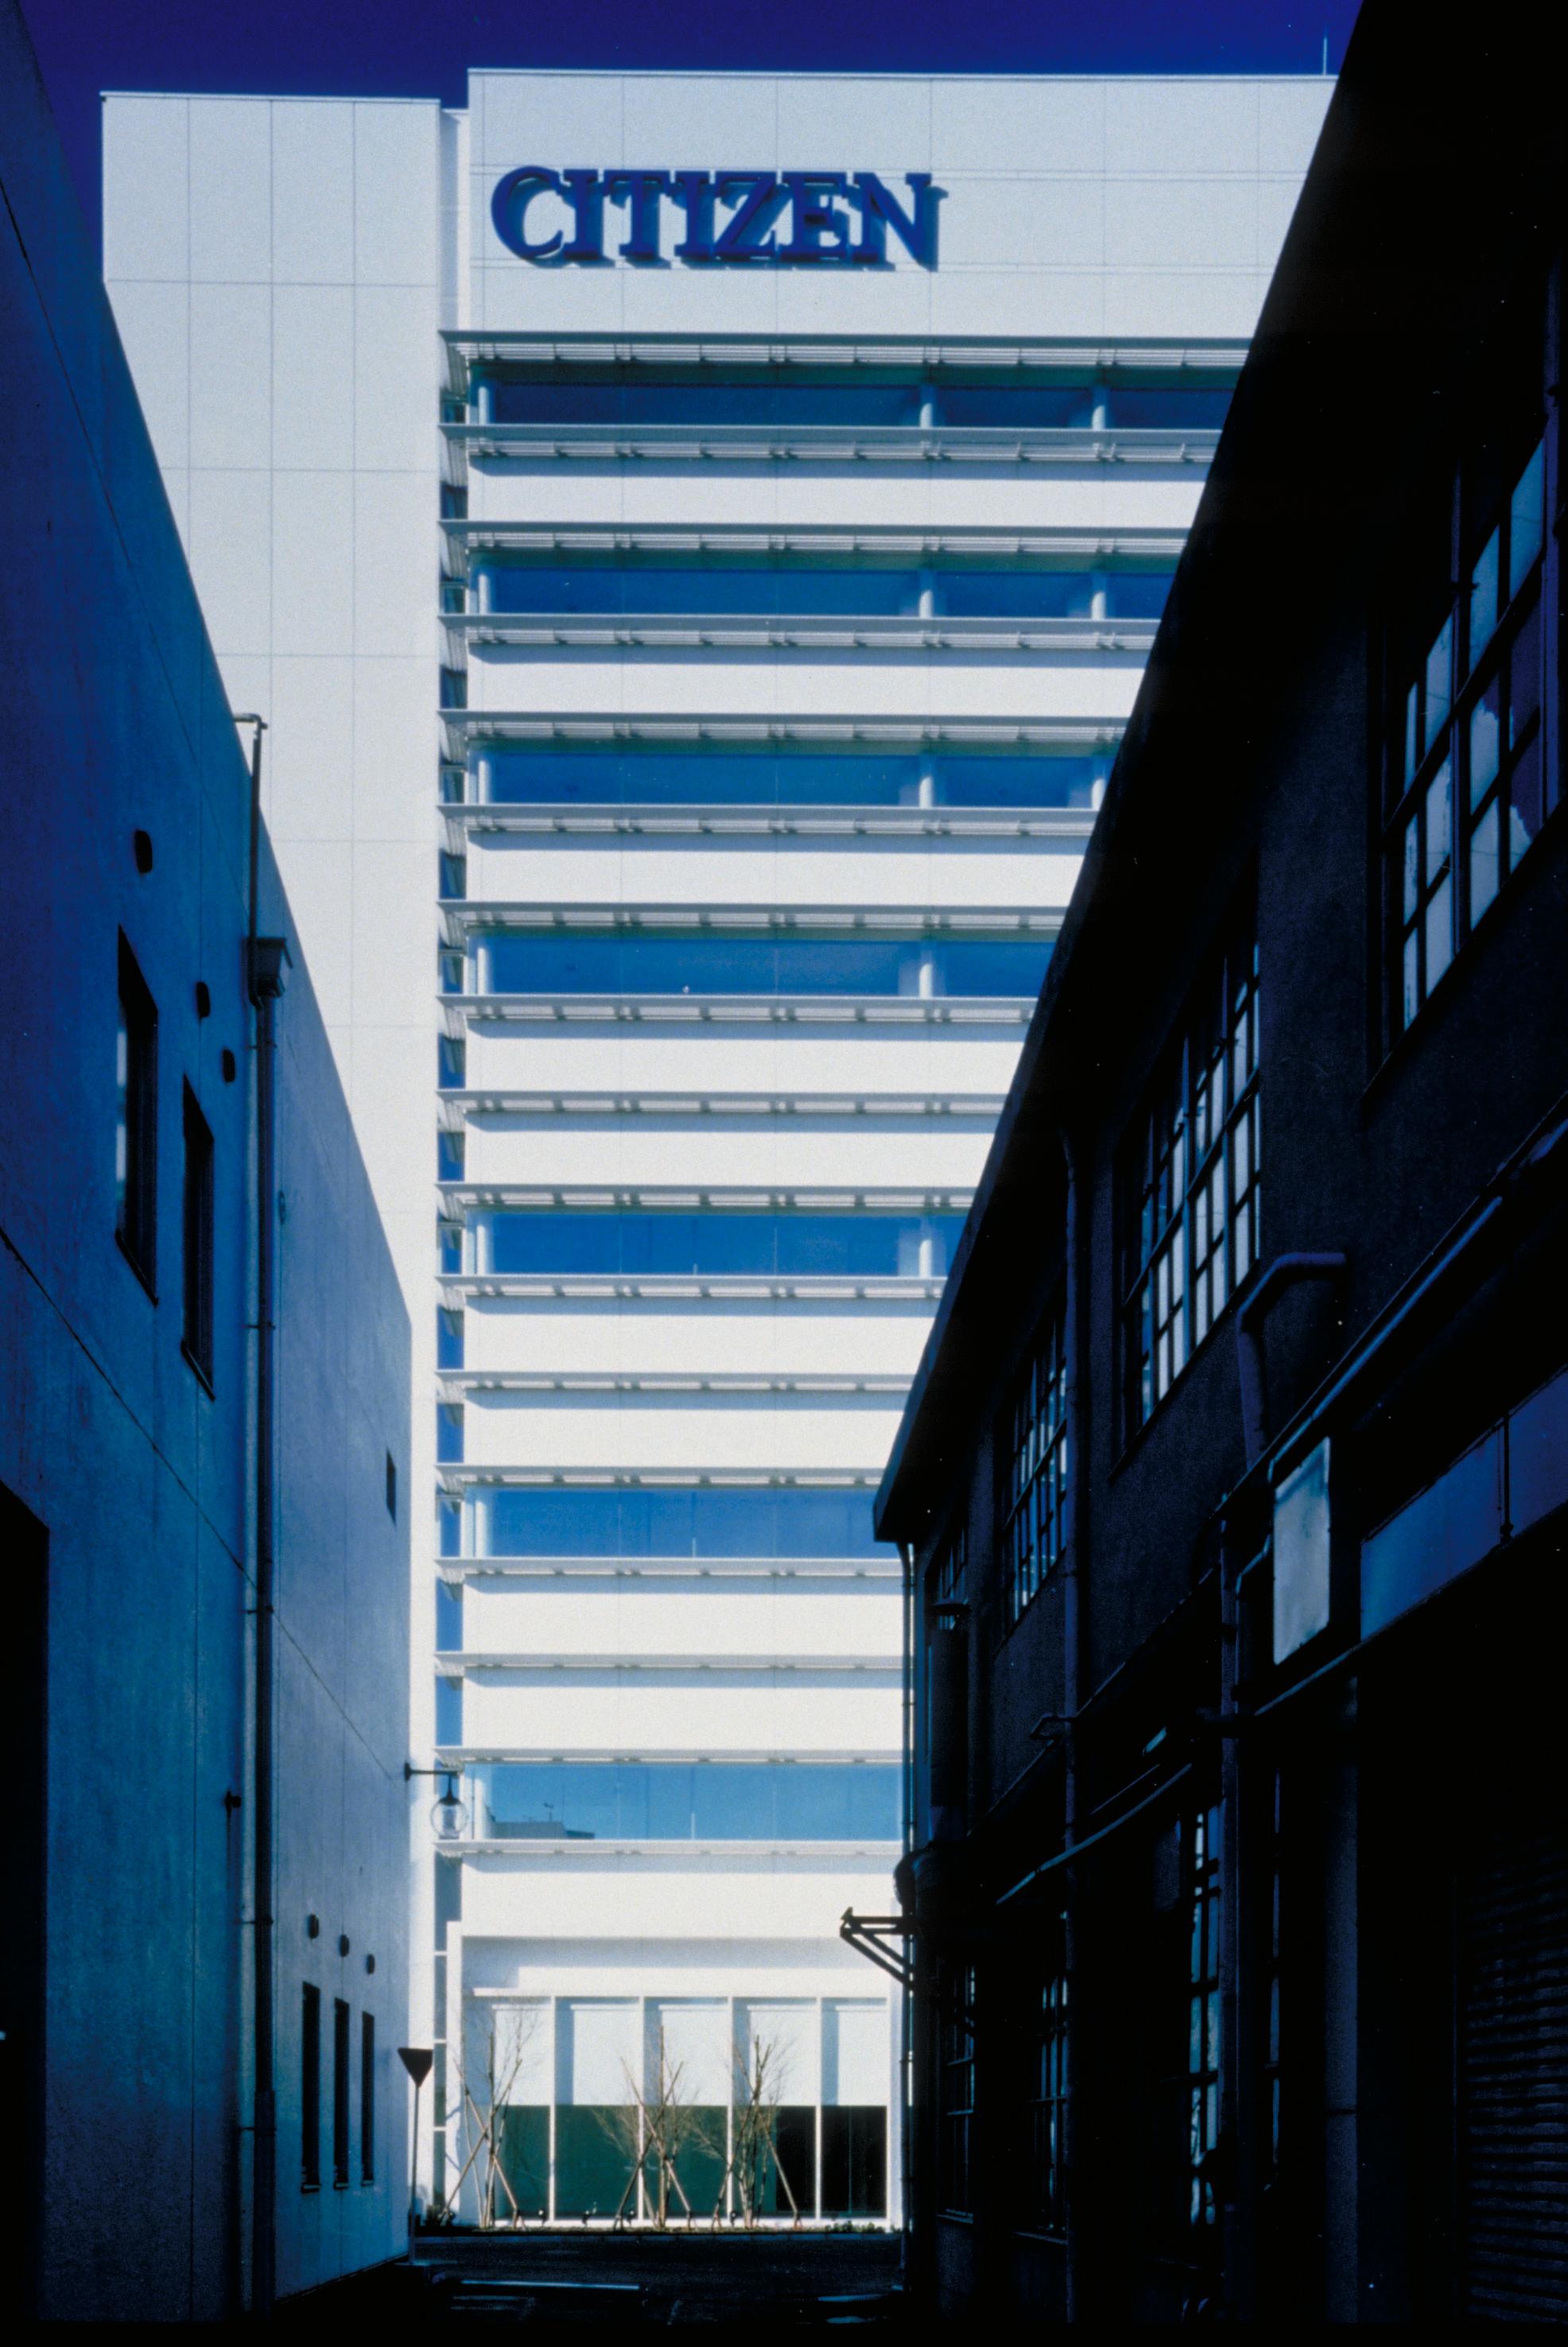 CITIZEN TANASHI HEAD OFFICE